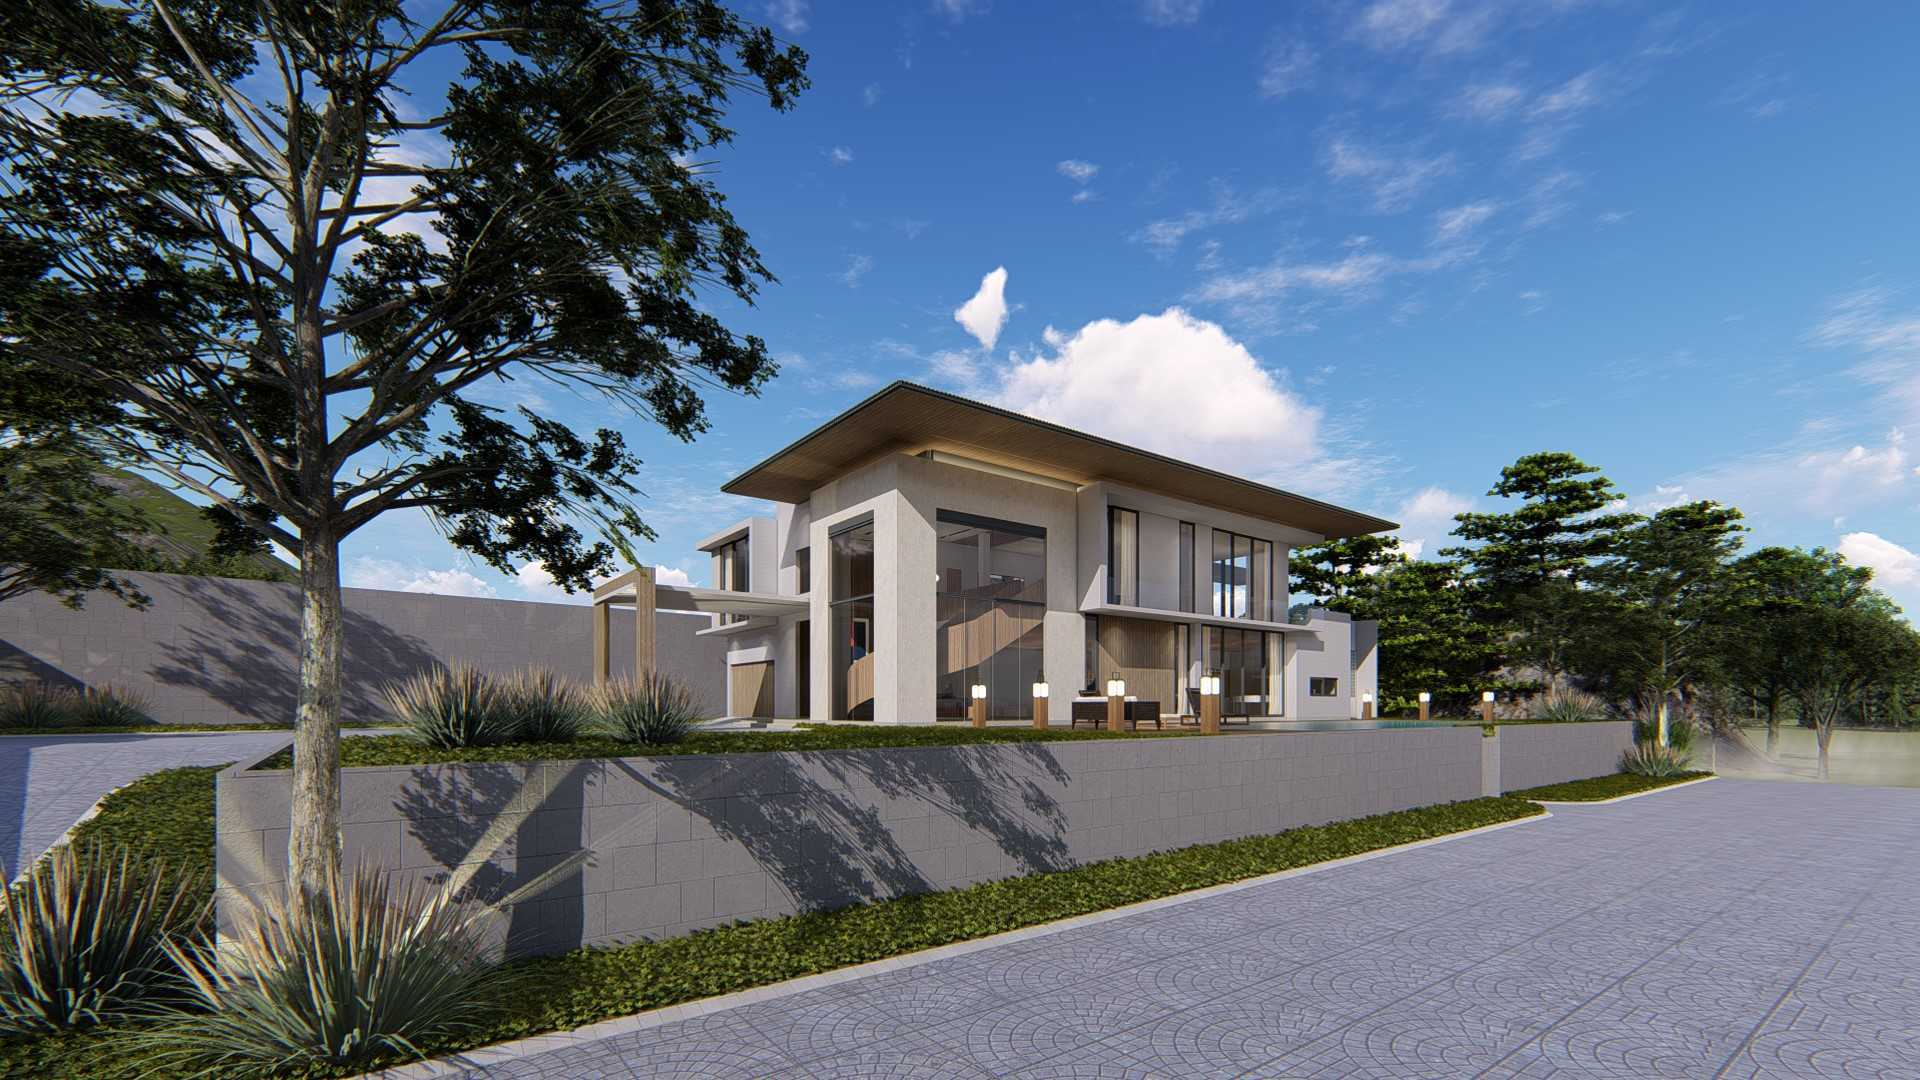 Samitrayasa Design Hr Residence Bogor, Jawa Barat, Indonesia Bogor, Jawa Barat, Indonesia Samitrayasa-Design-Hr-Residence  122113